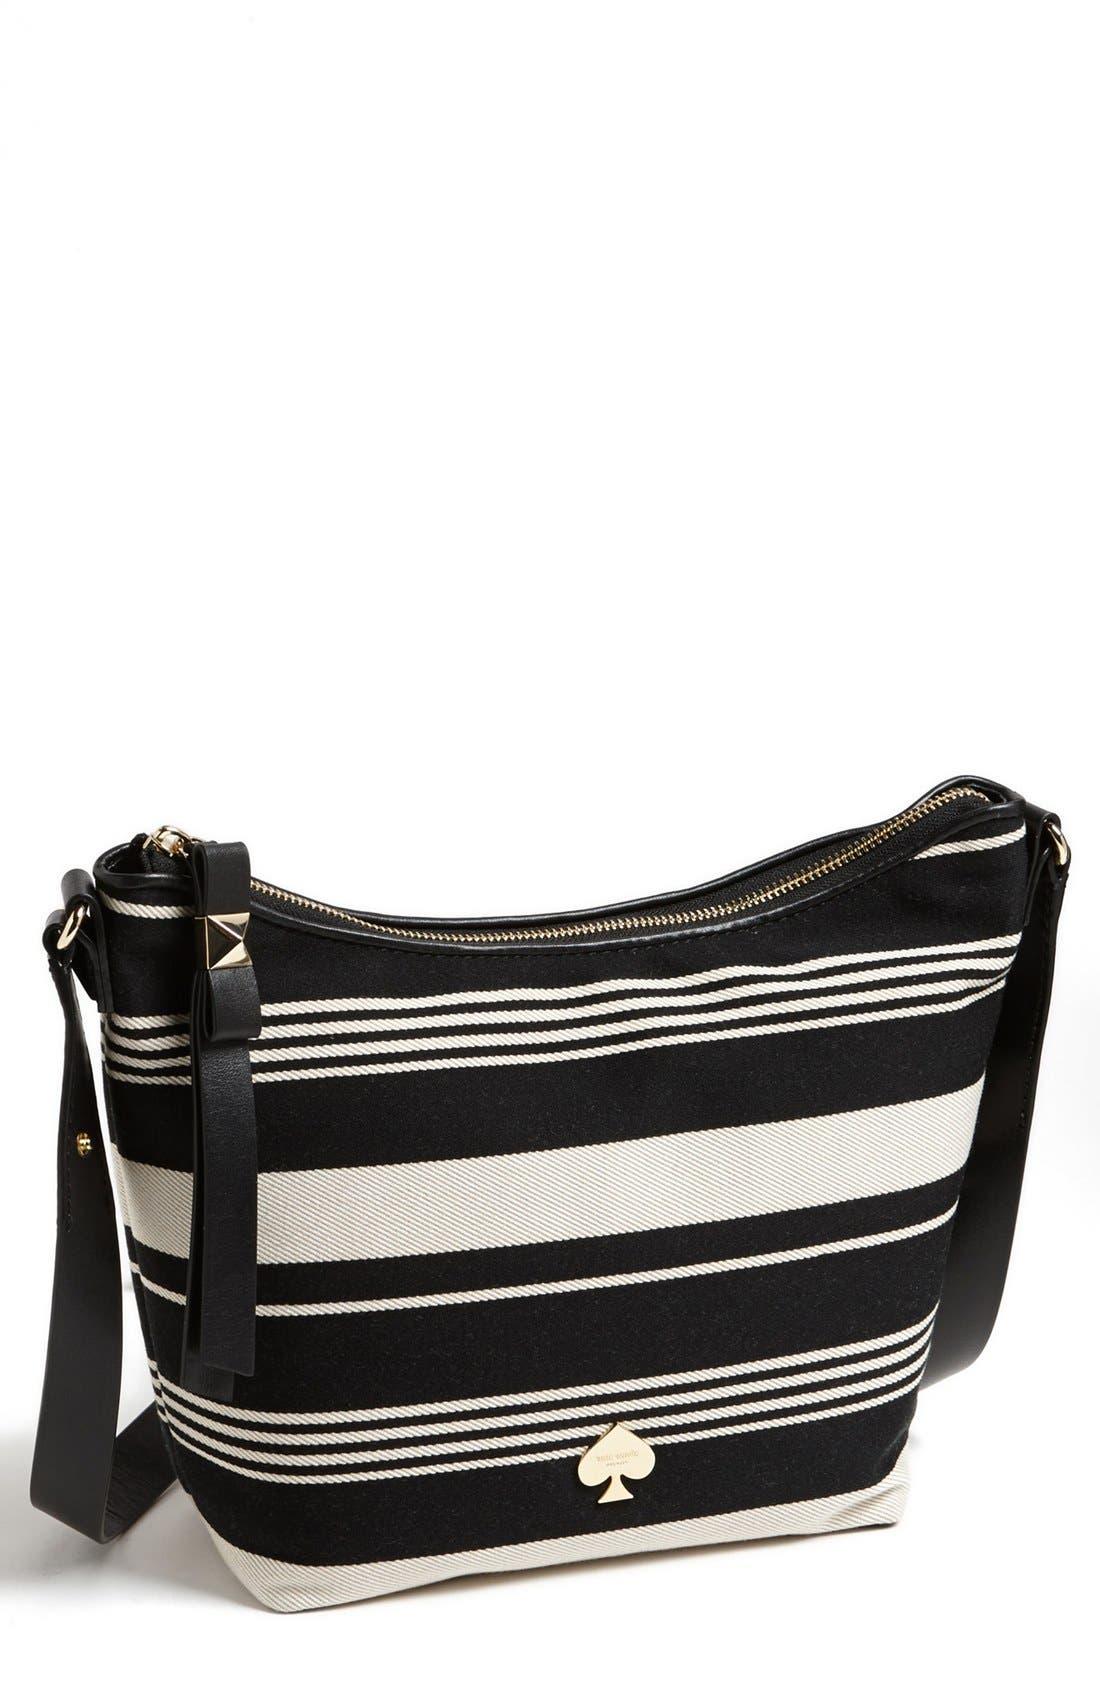 Main Image - kate spade new york 'leroy street - stripe vivienne' satchel